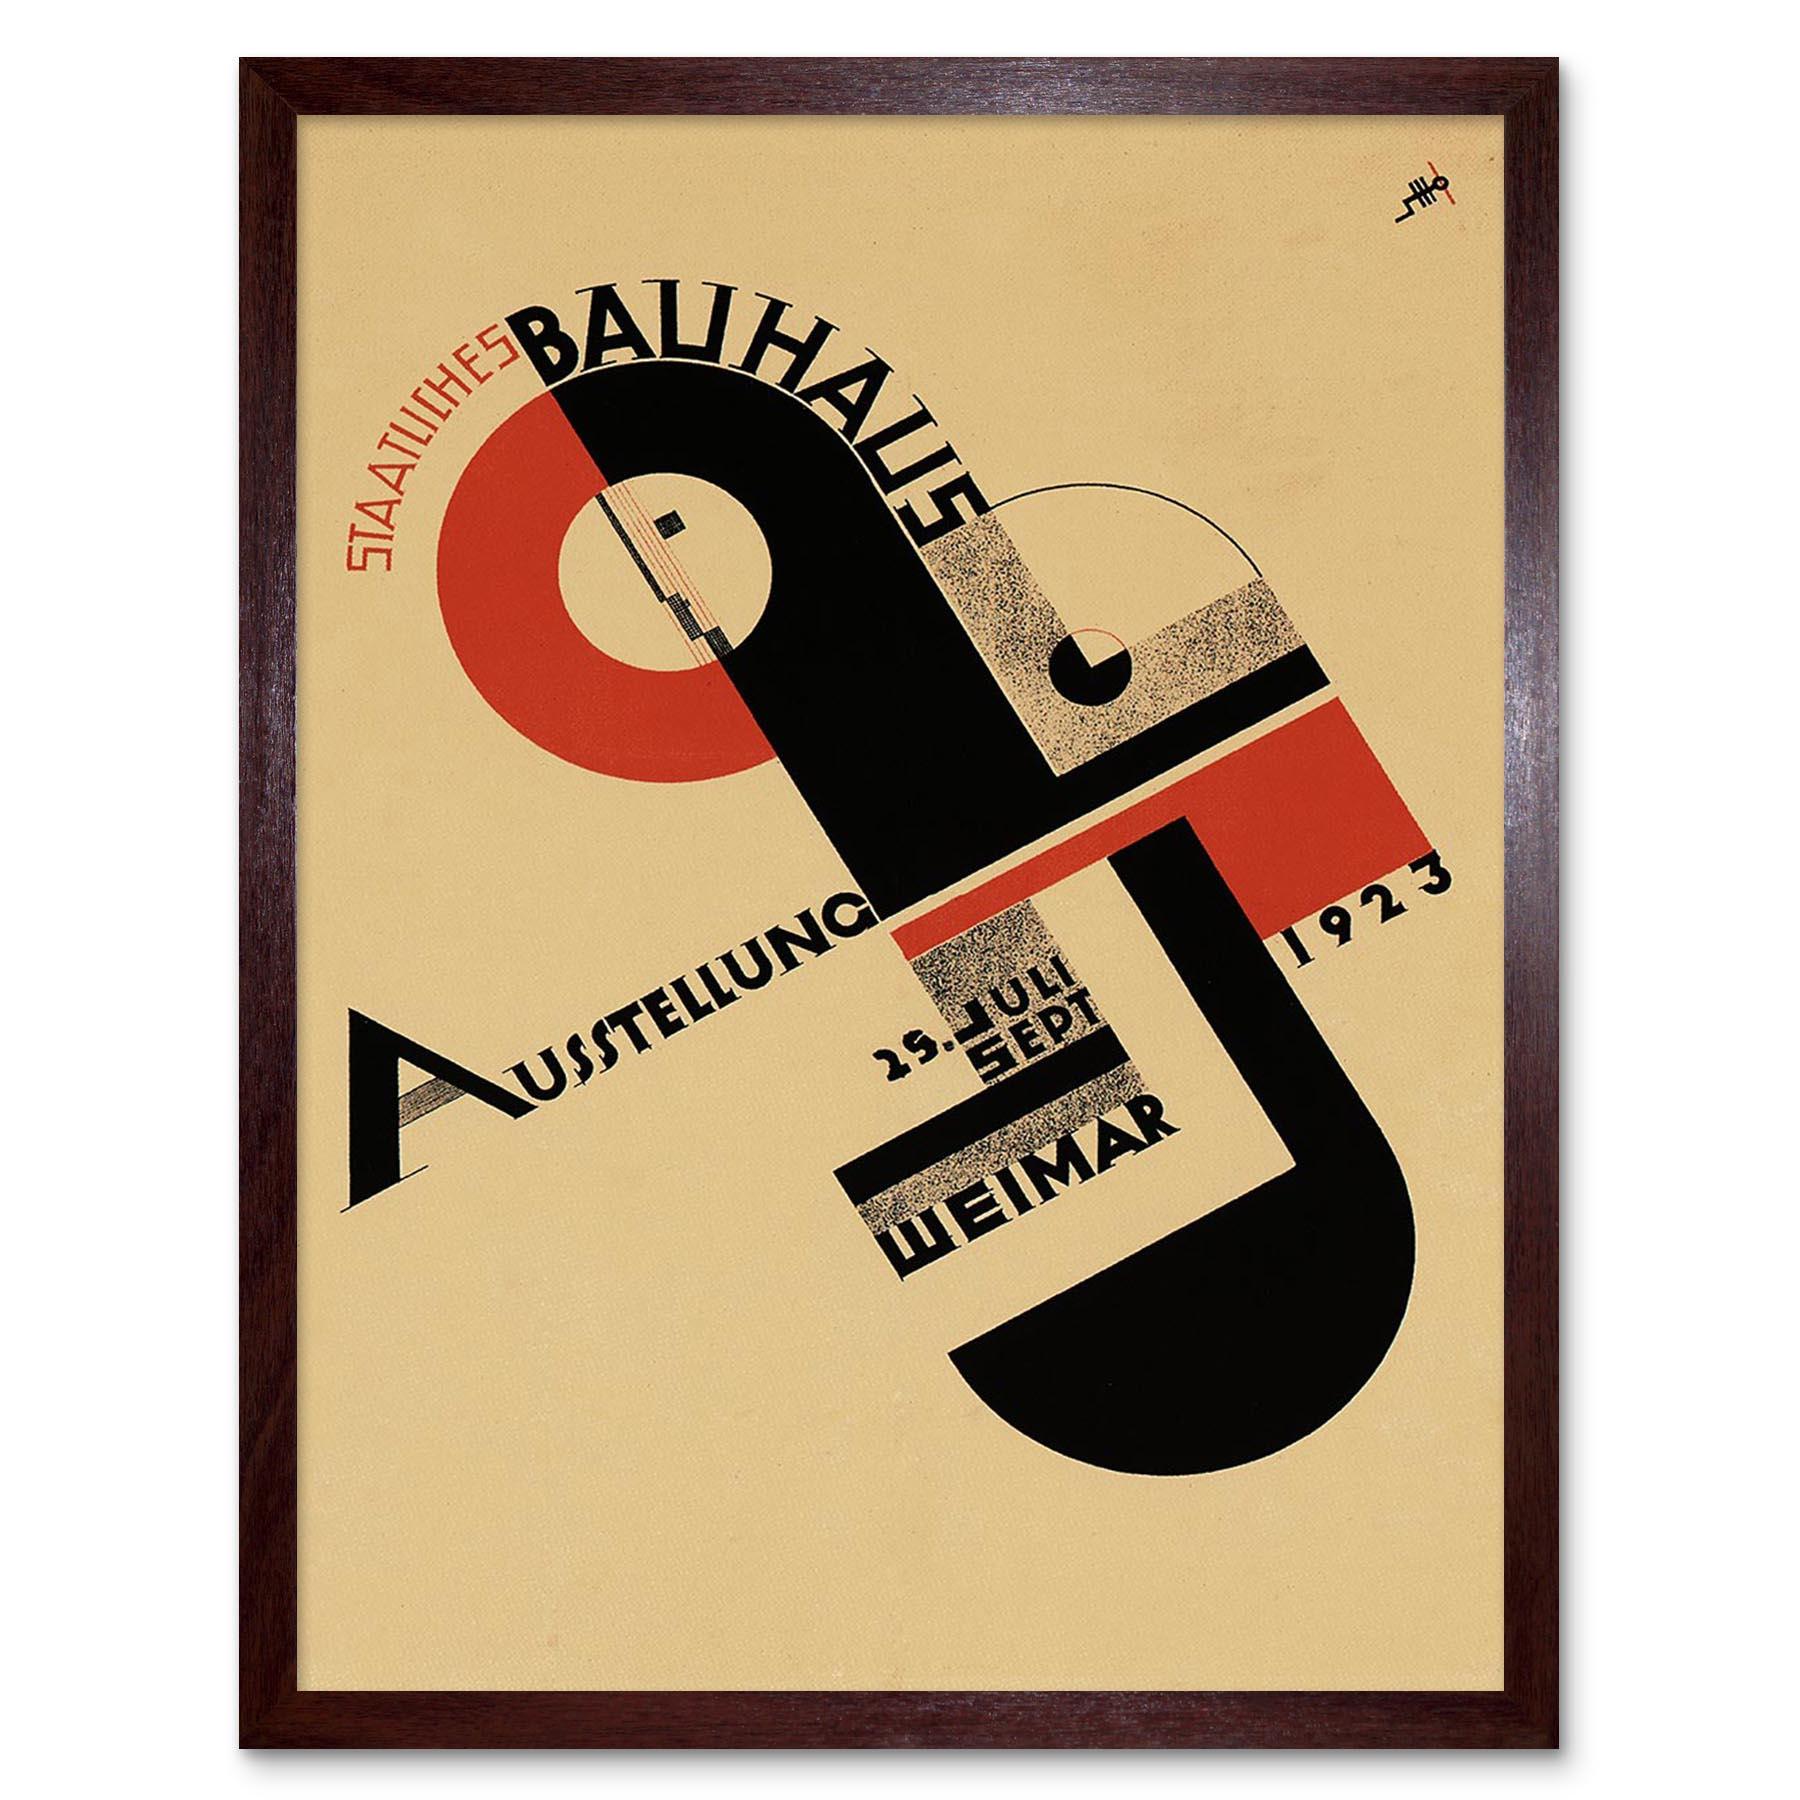 Exhibition Bauhaus Weimar Icon Germany Vintage Retro Advertising Framed Print